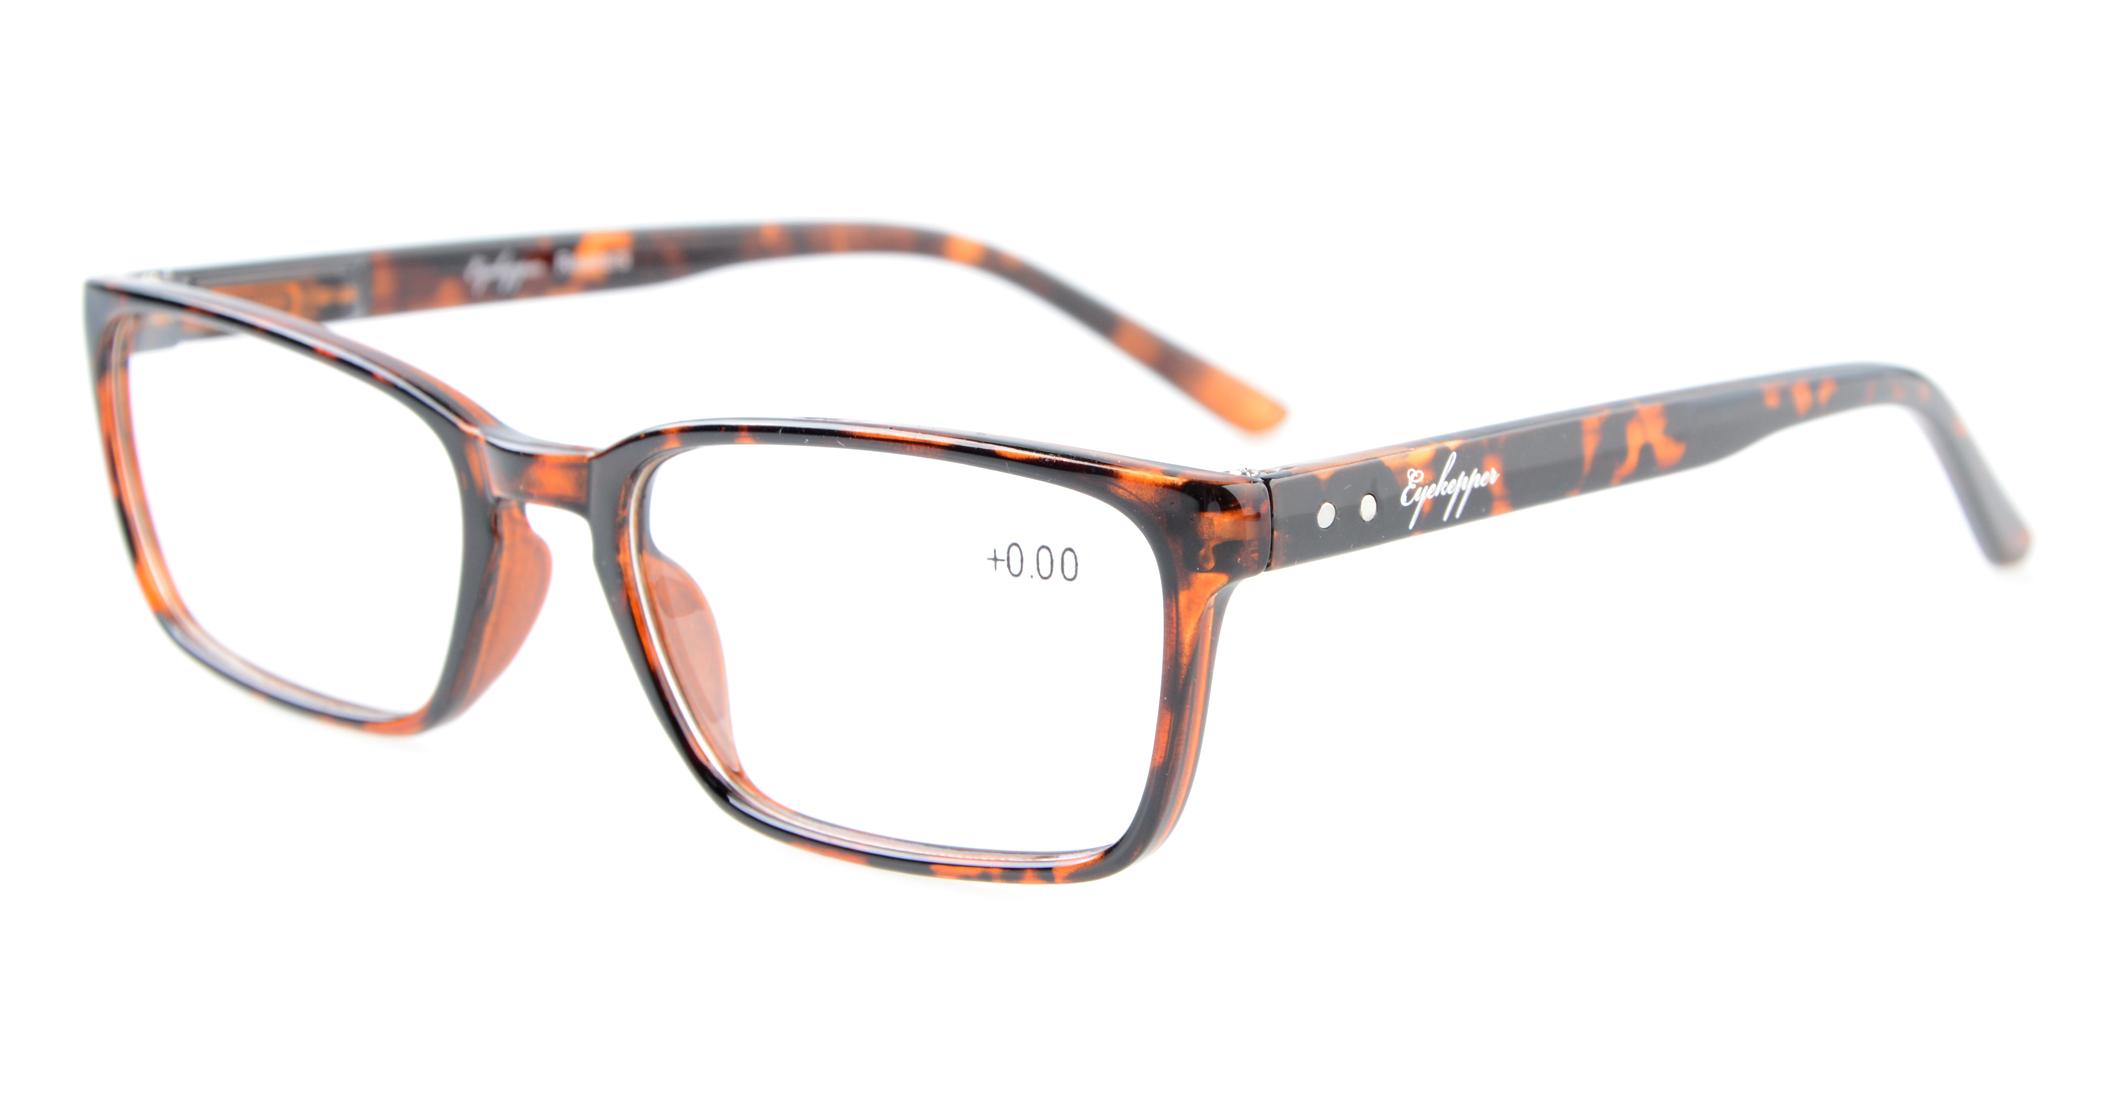 85fc99b52ec Retro Spring Hinges Reading Glasses For Men Women R898 Item NO  R898